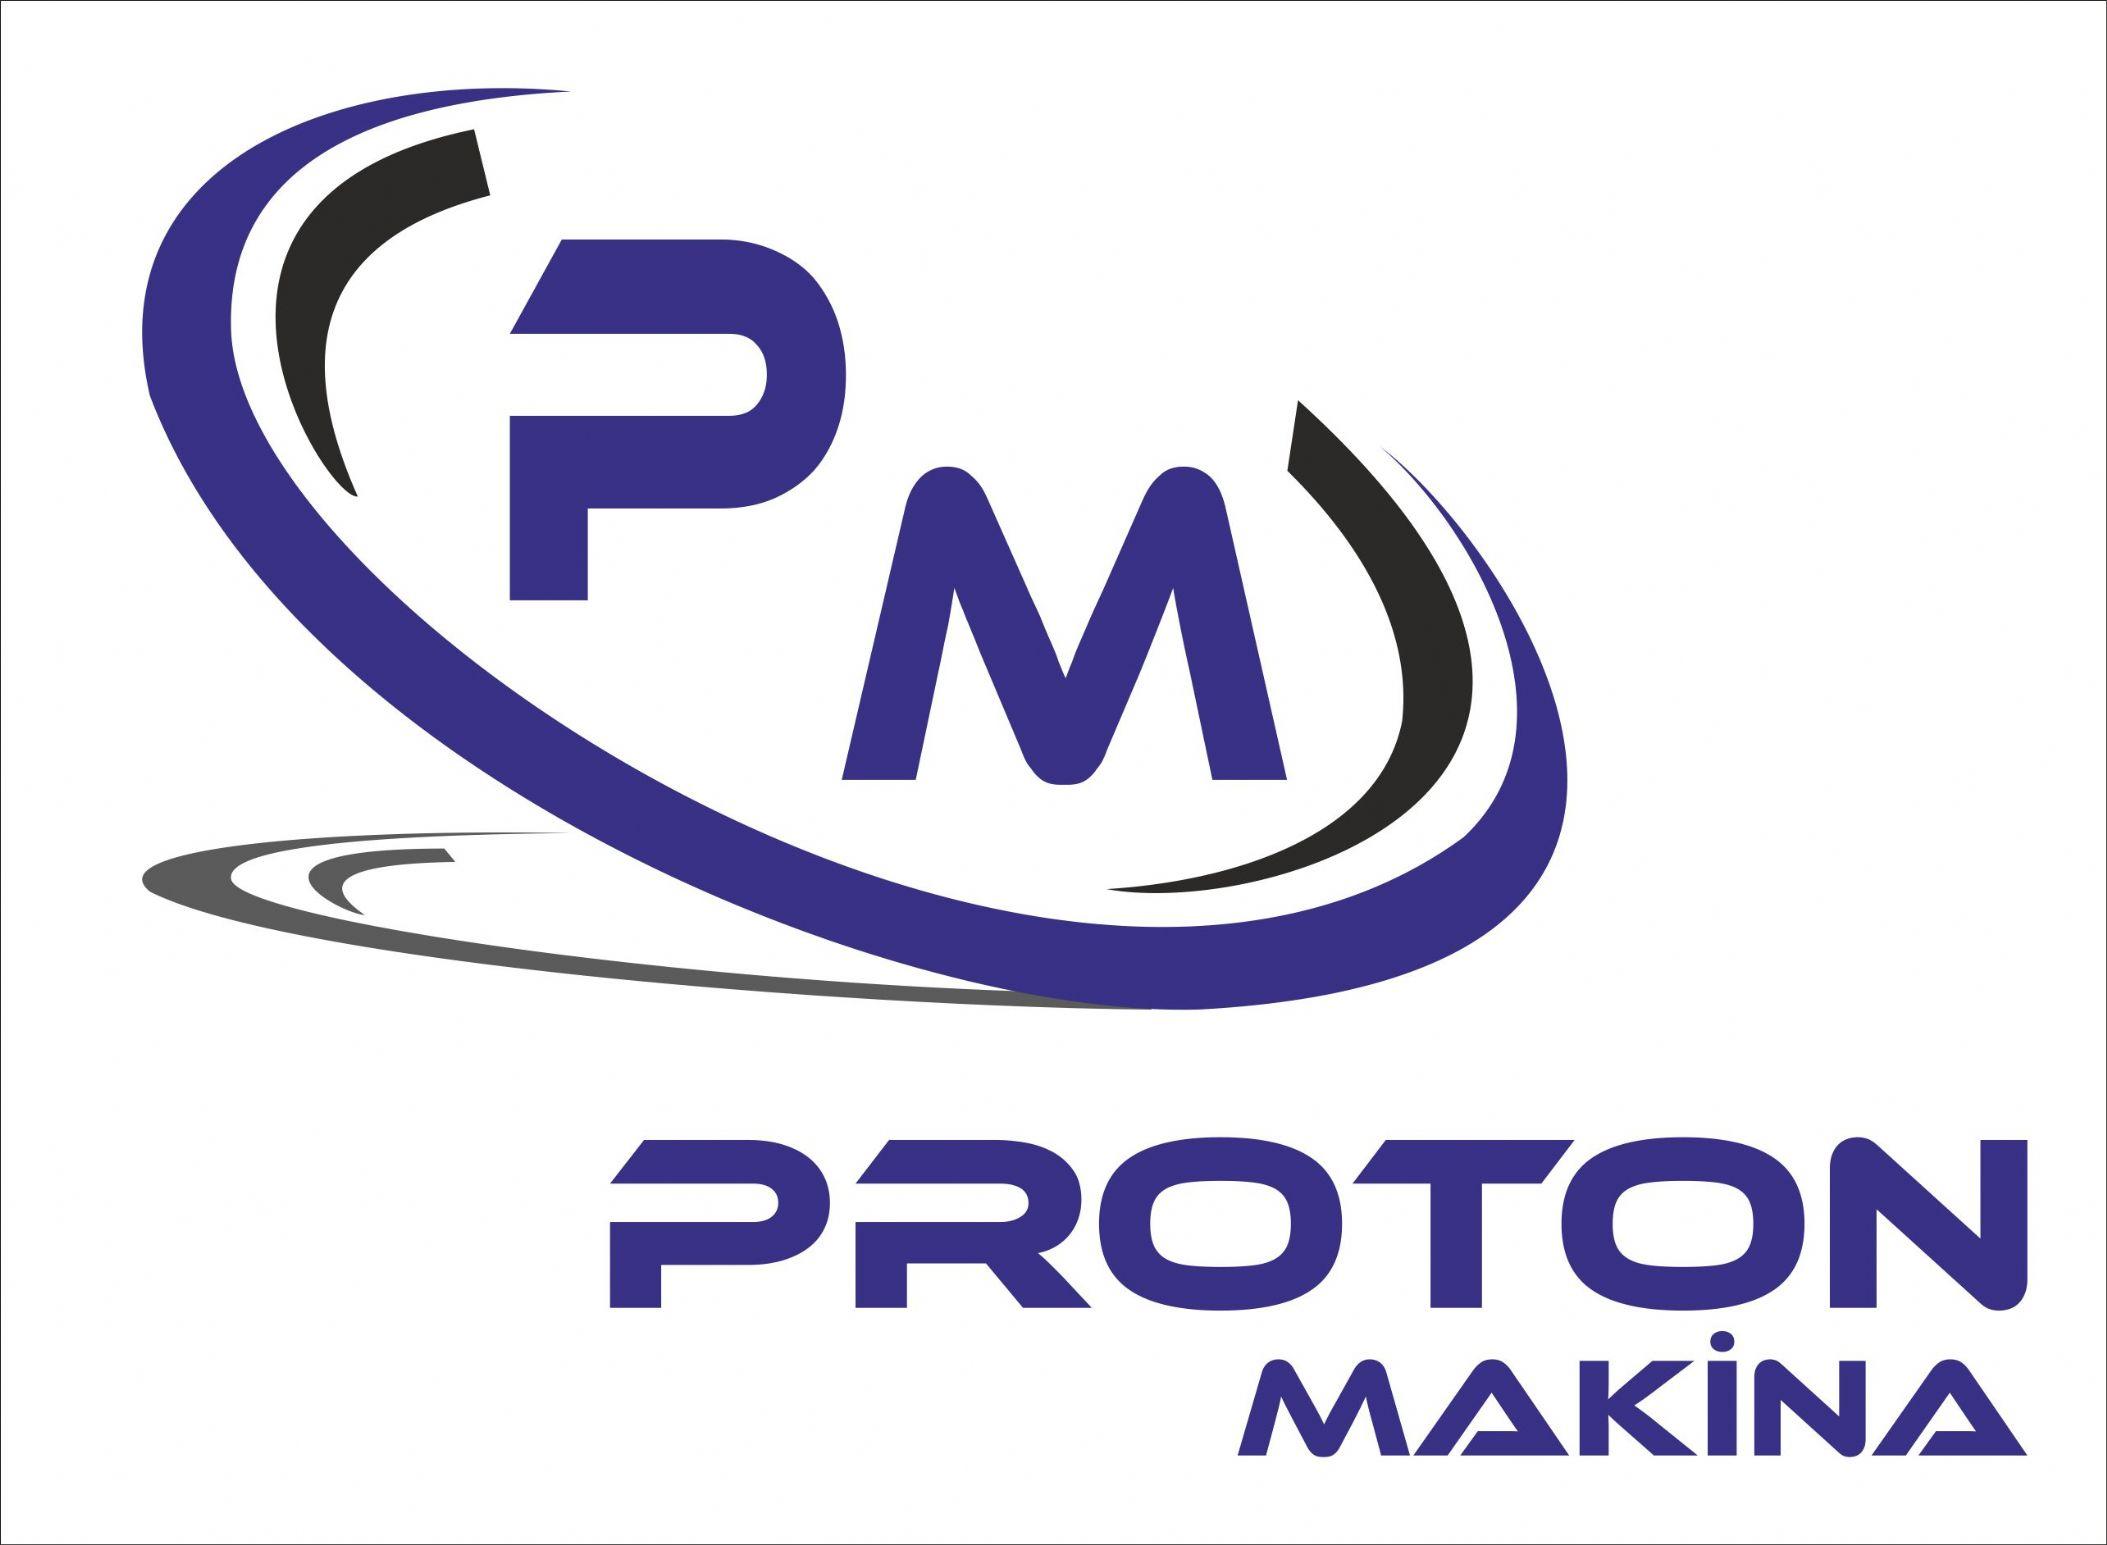 Proton Makina